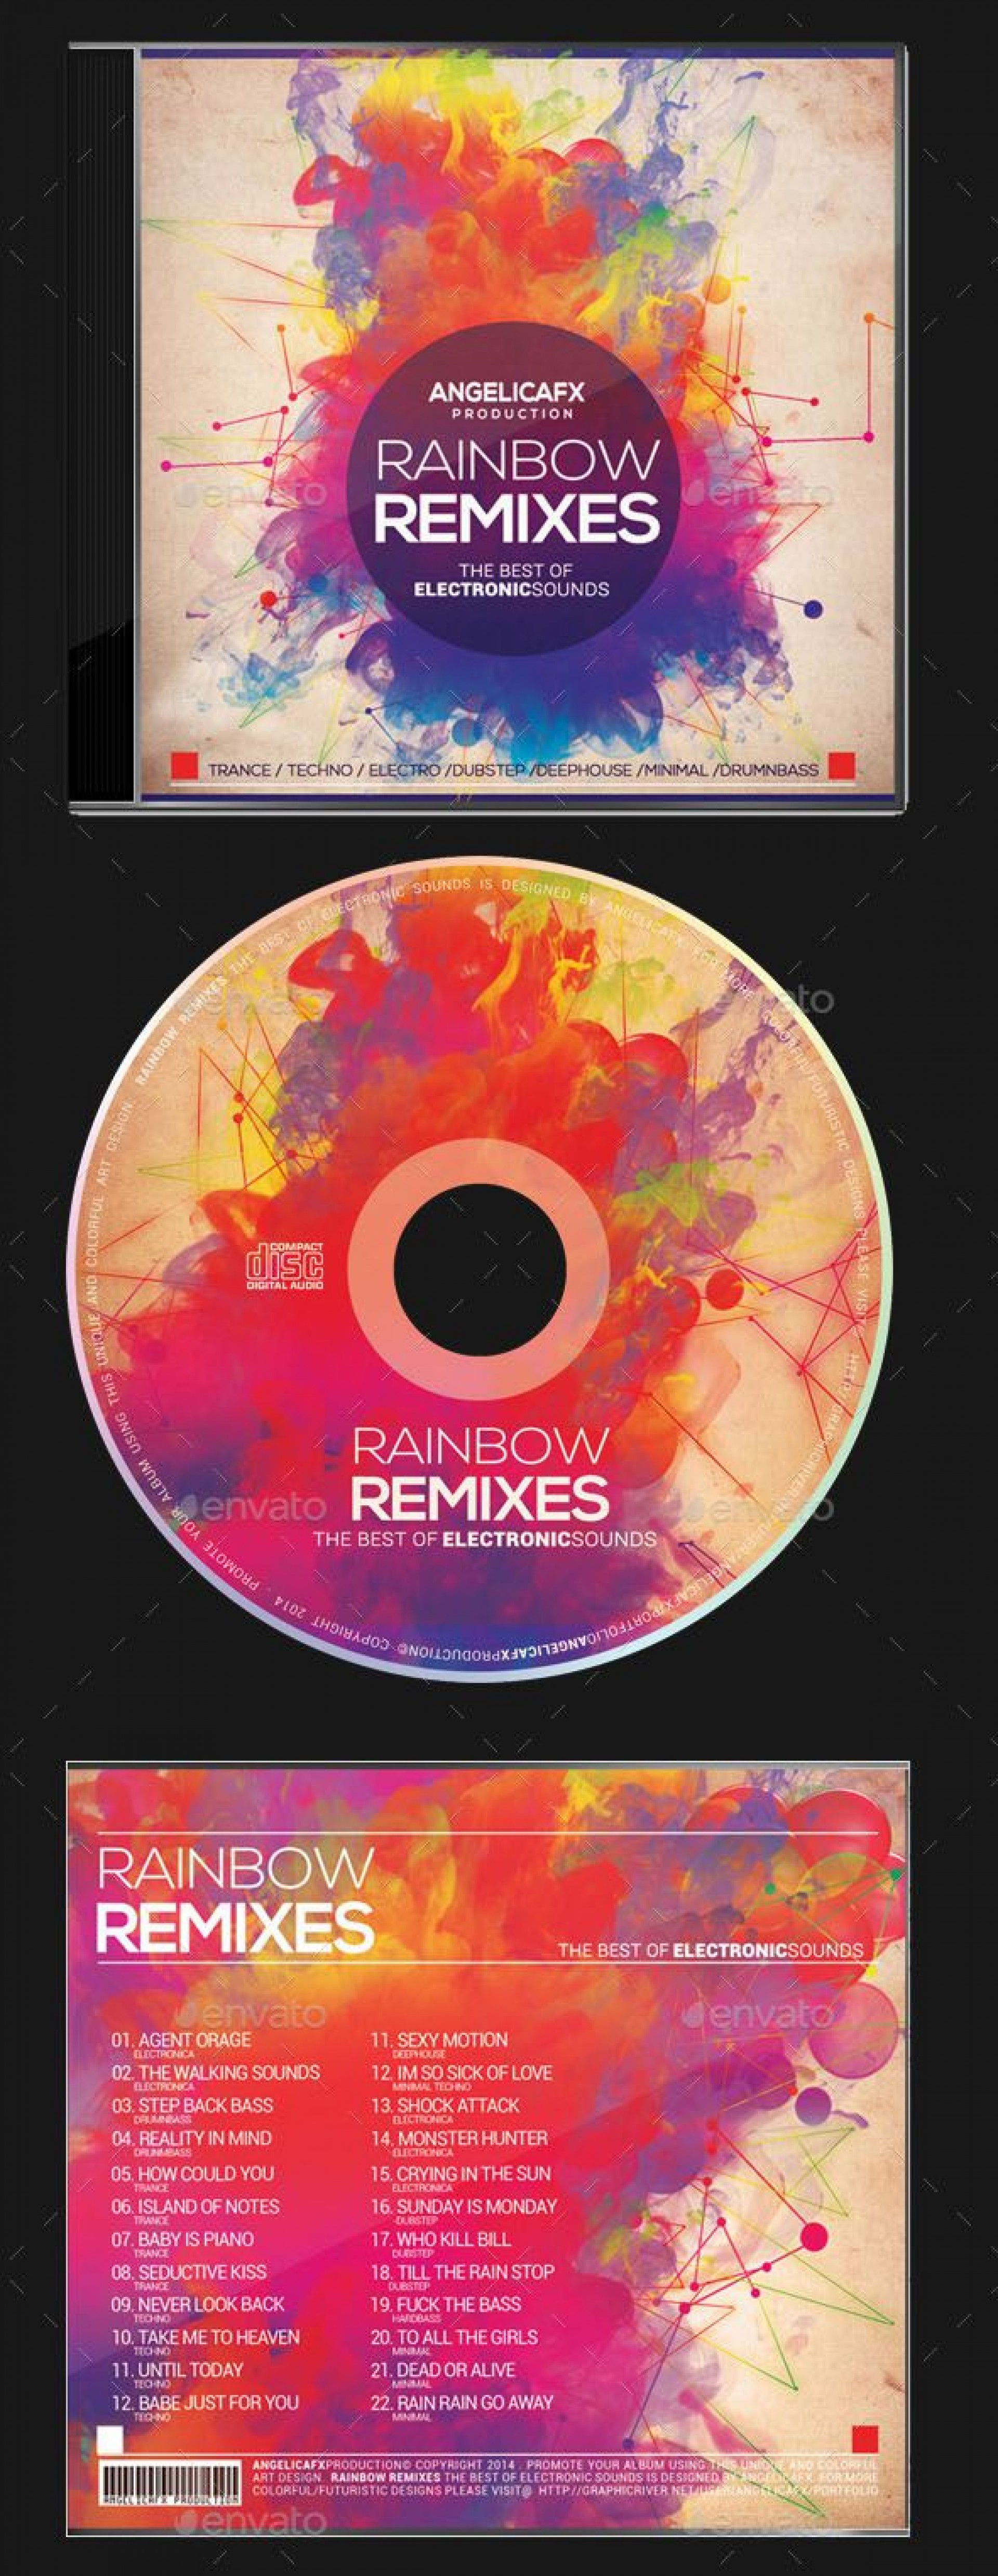 003 Wondrou Cd Label Design Template Free Download  Cover Psd1920